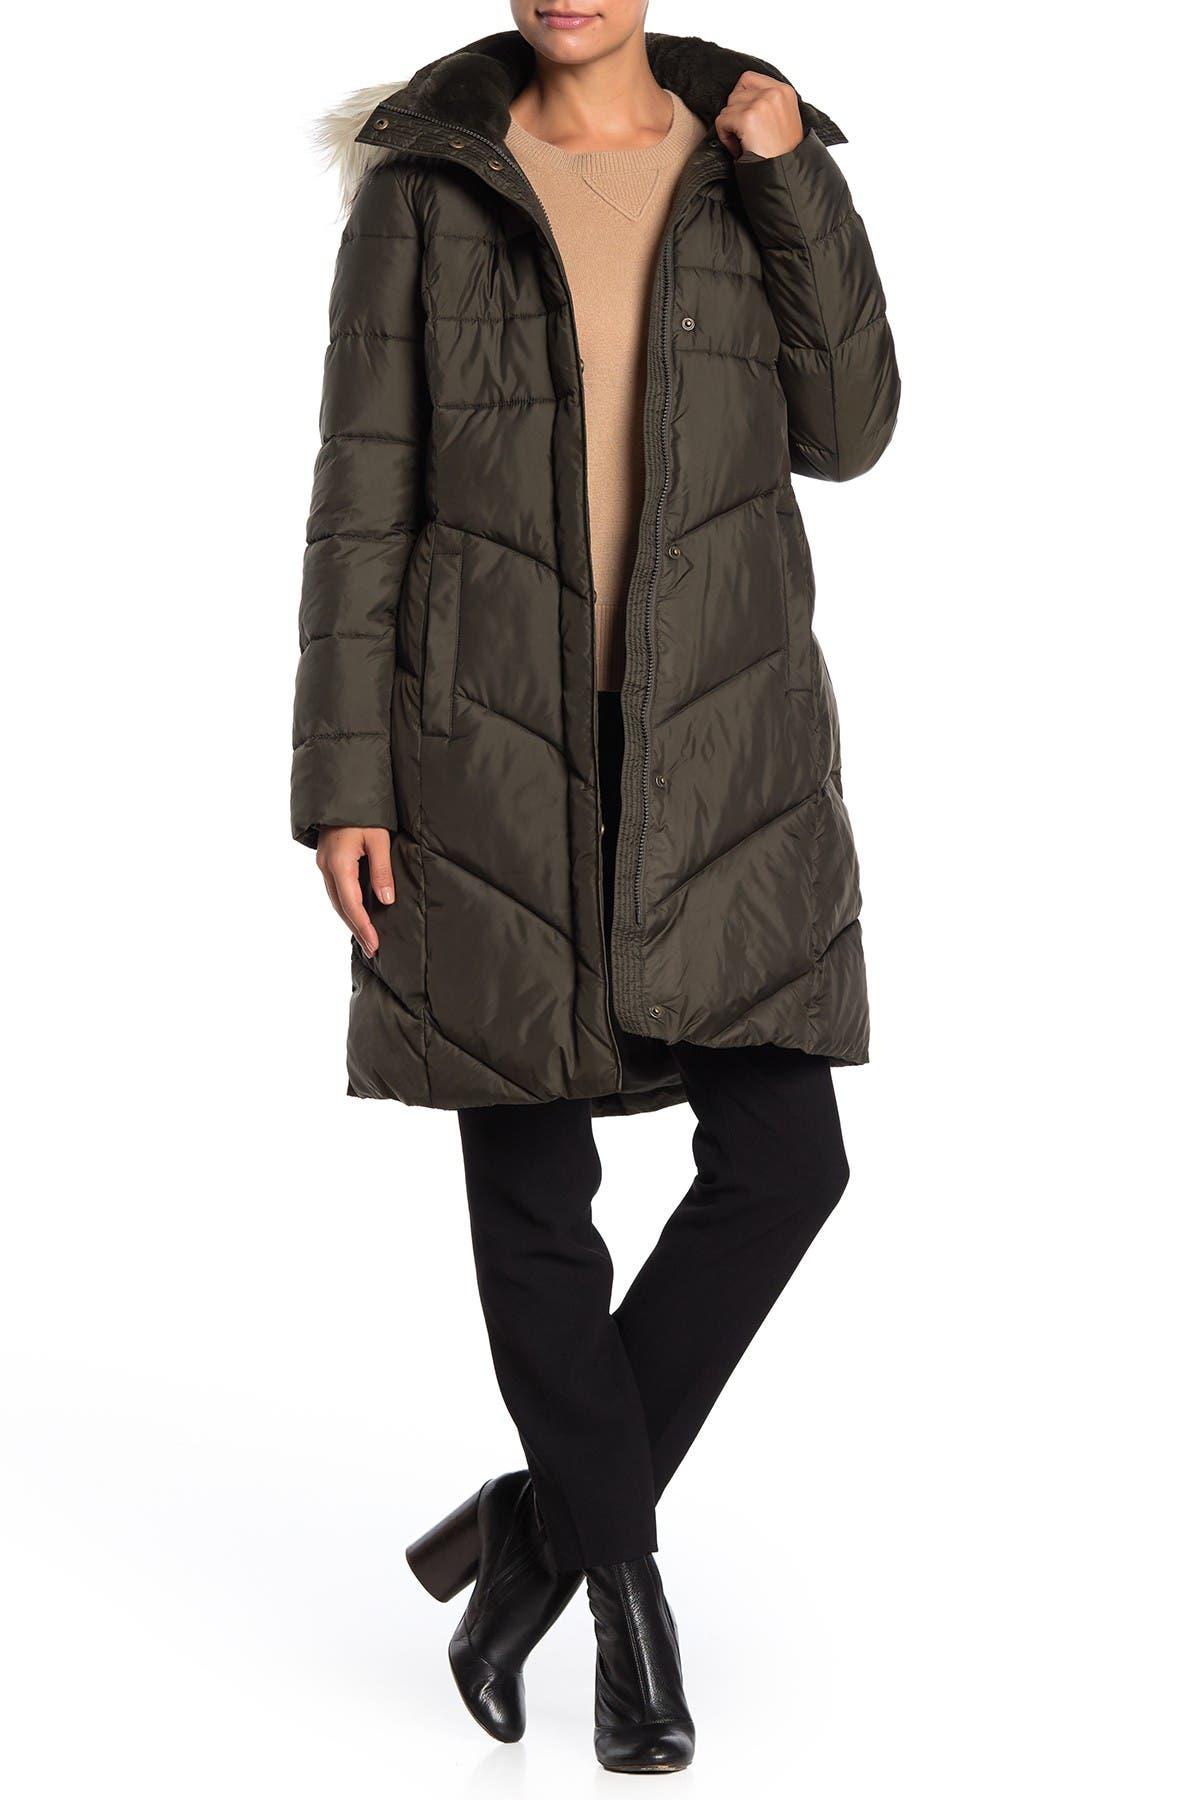 Image of Larry Levine Faux Fur Trim Hooded Coat